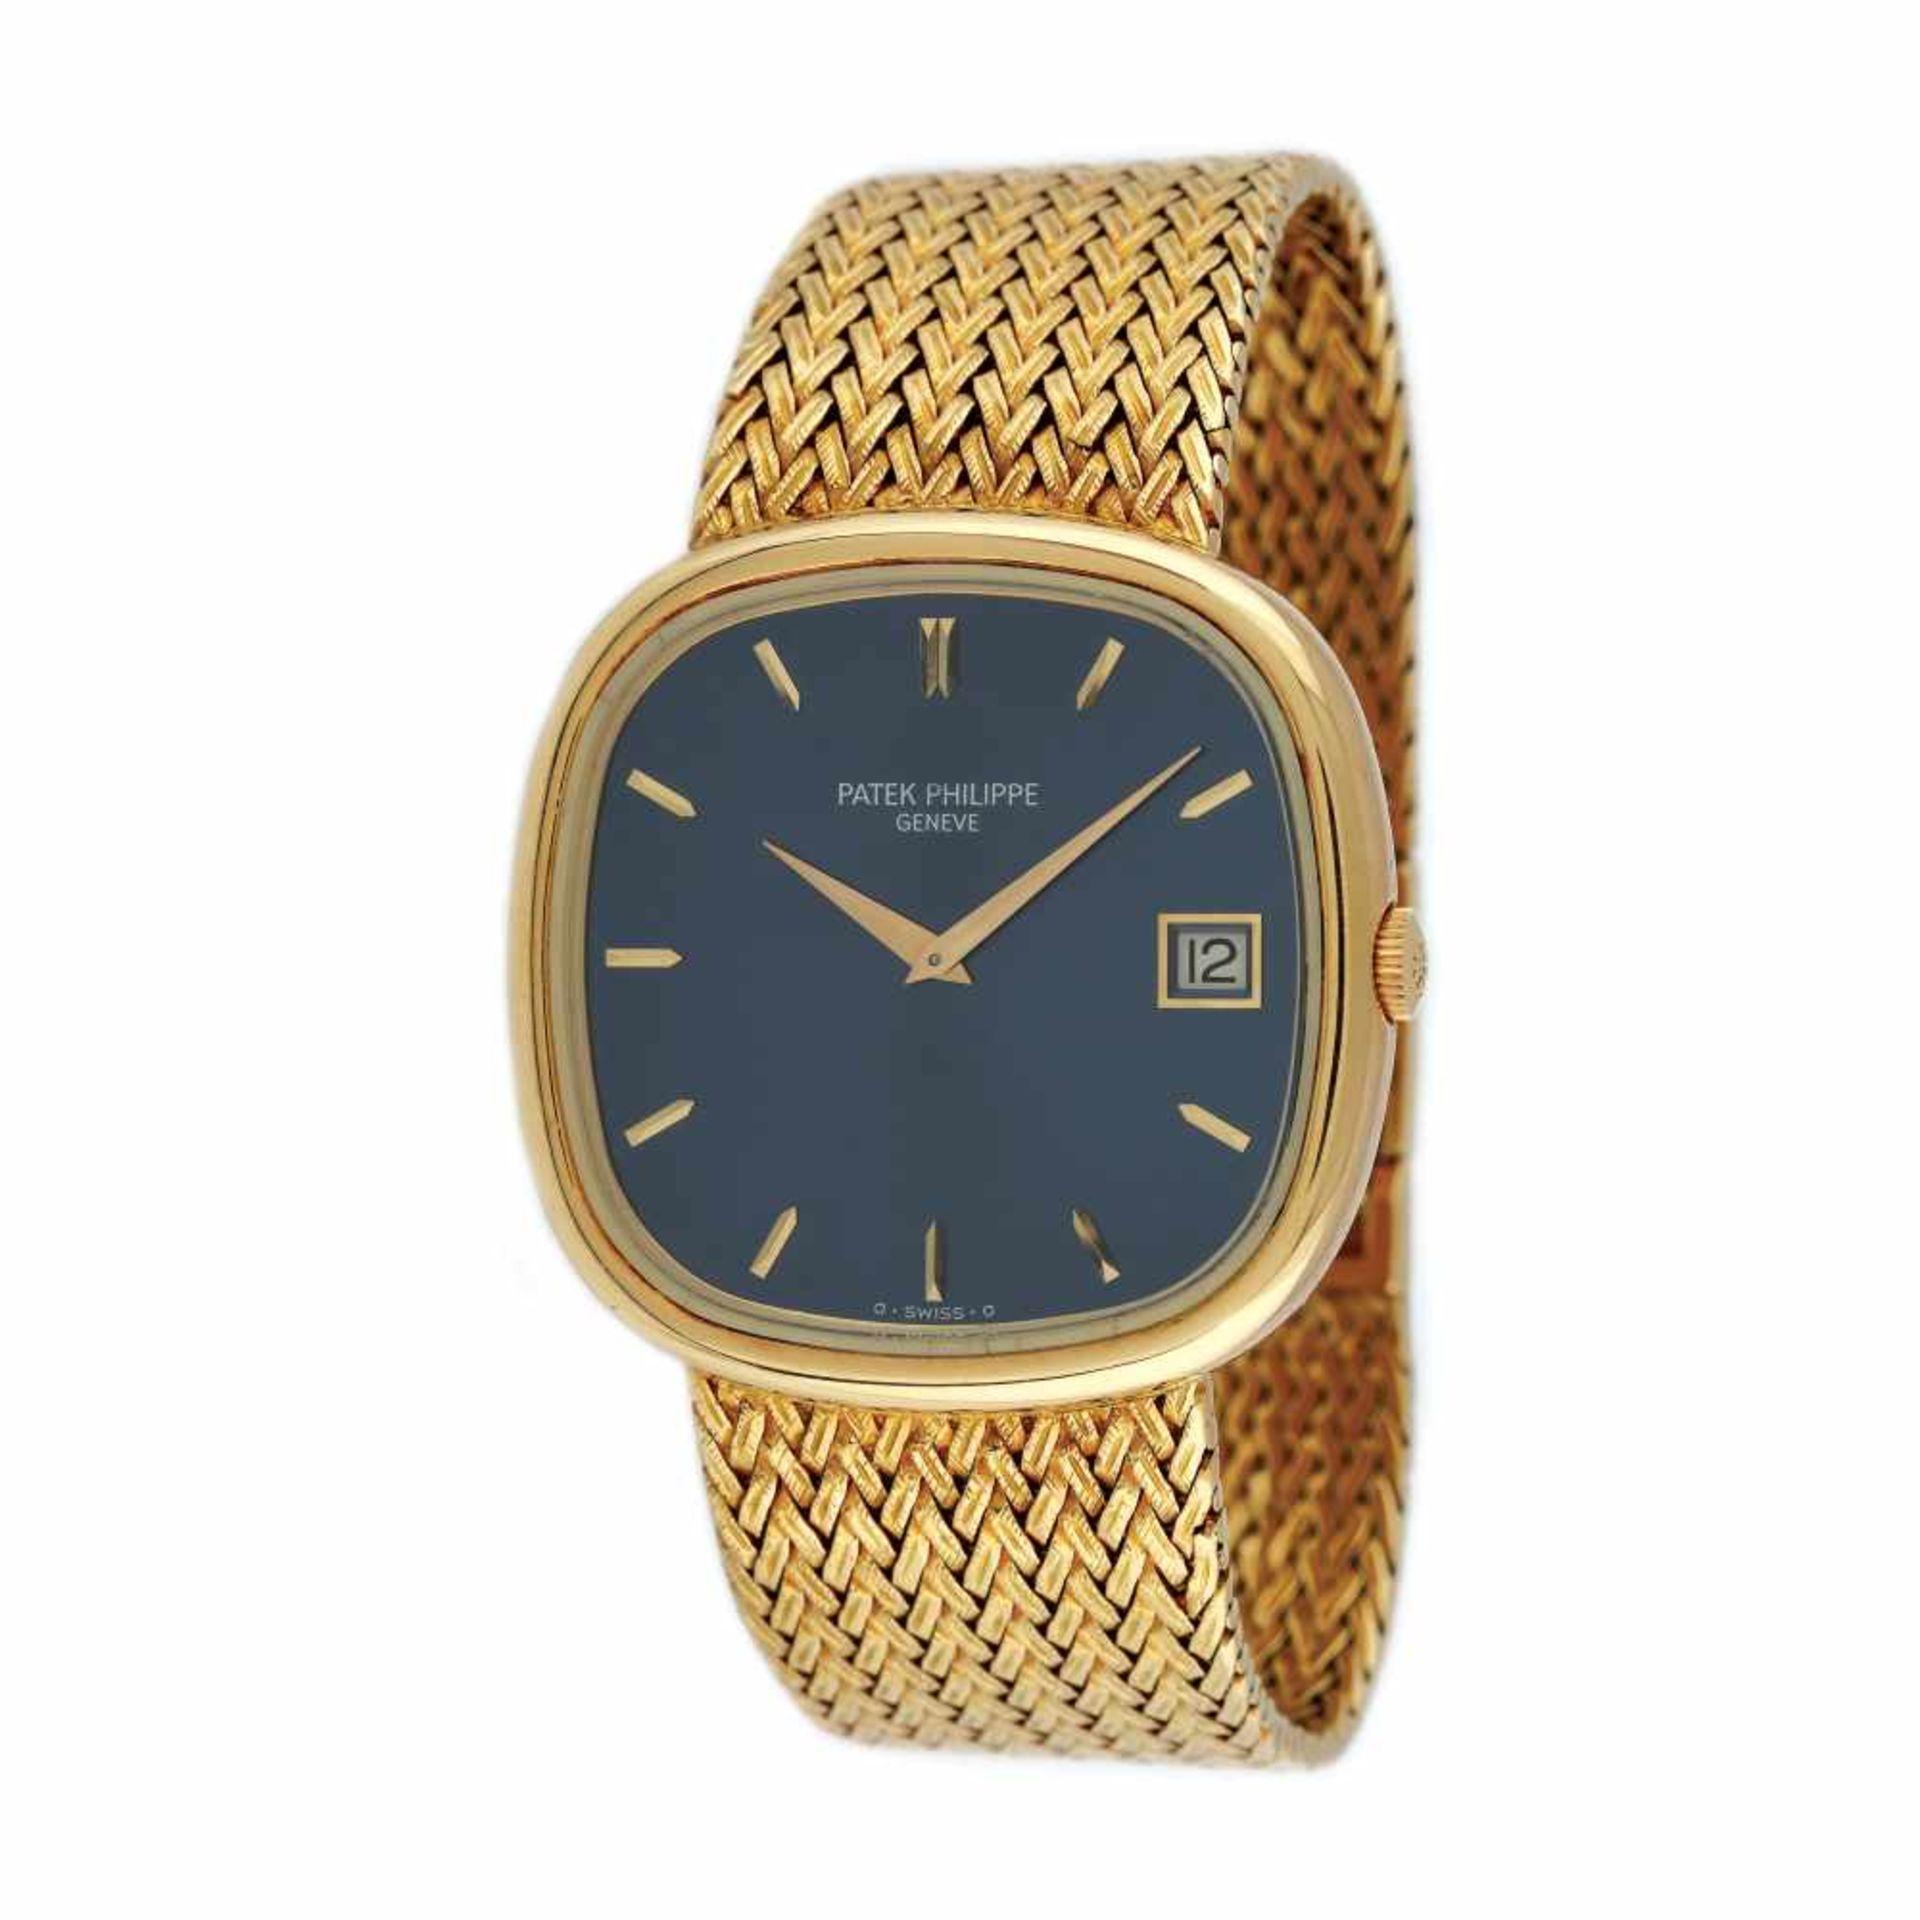 Patek Philippe Ellipse wristwatch, gold